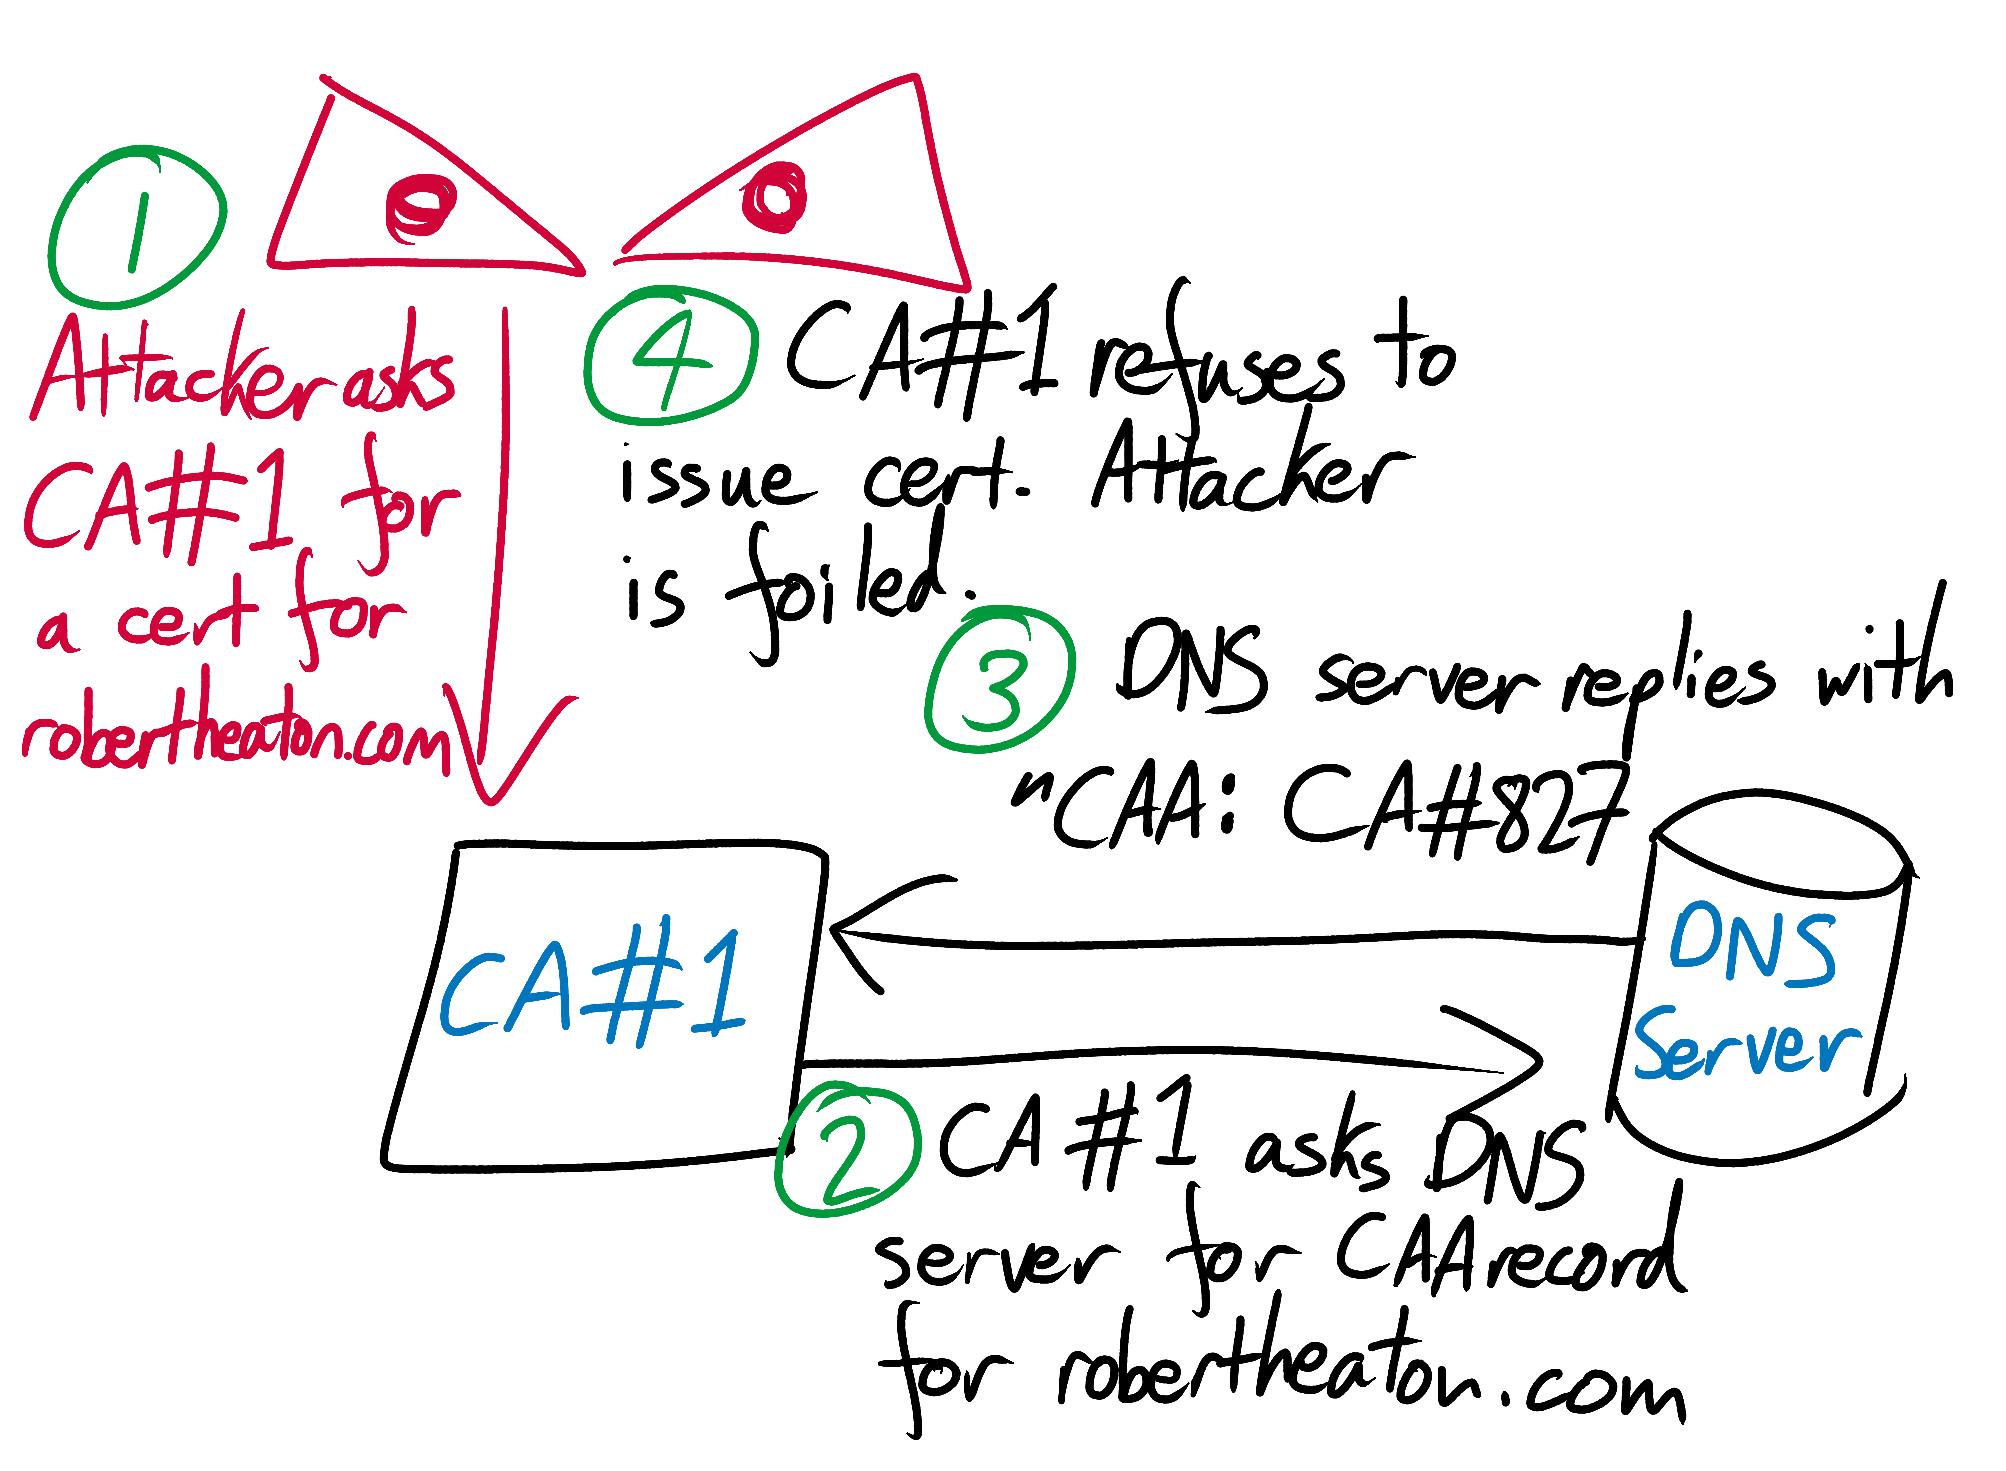 HTTPS in the real world | Robert Heaton